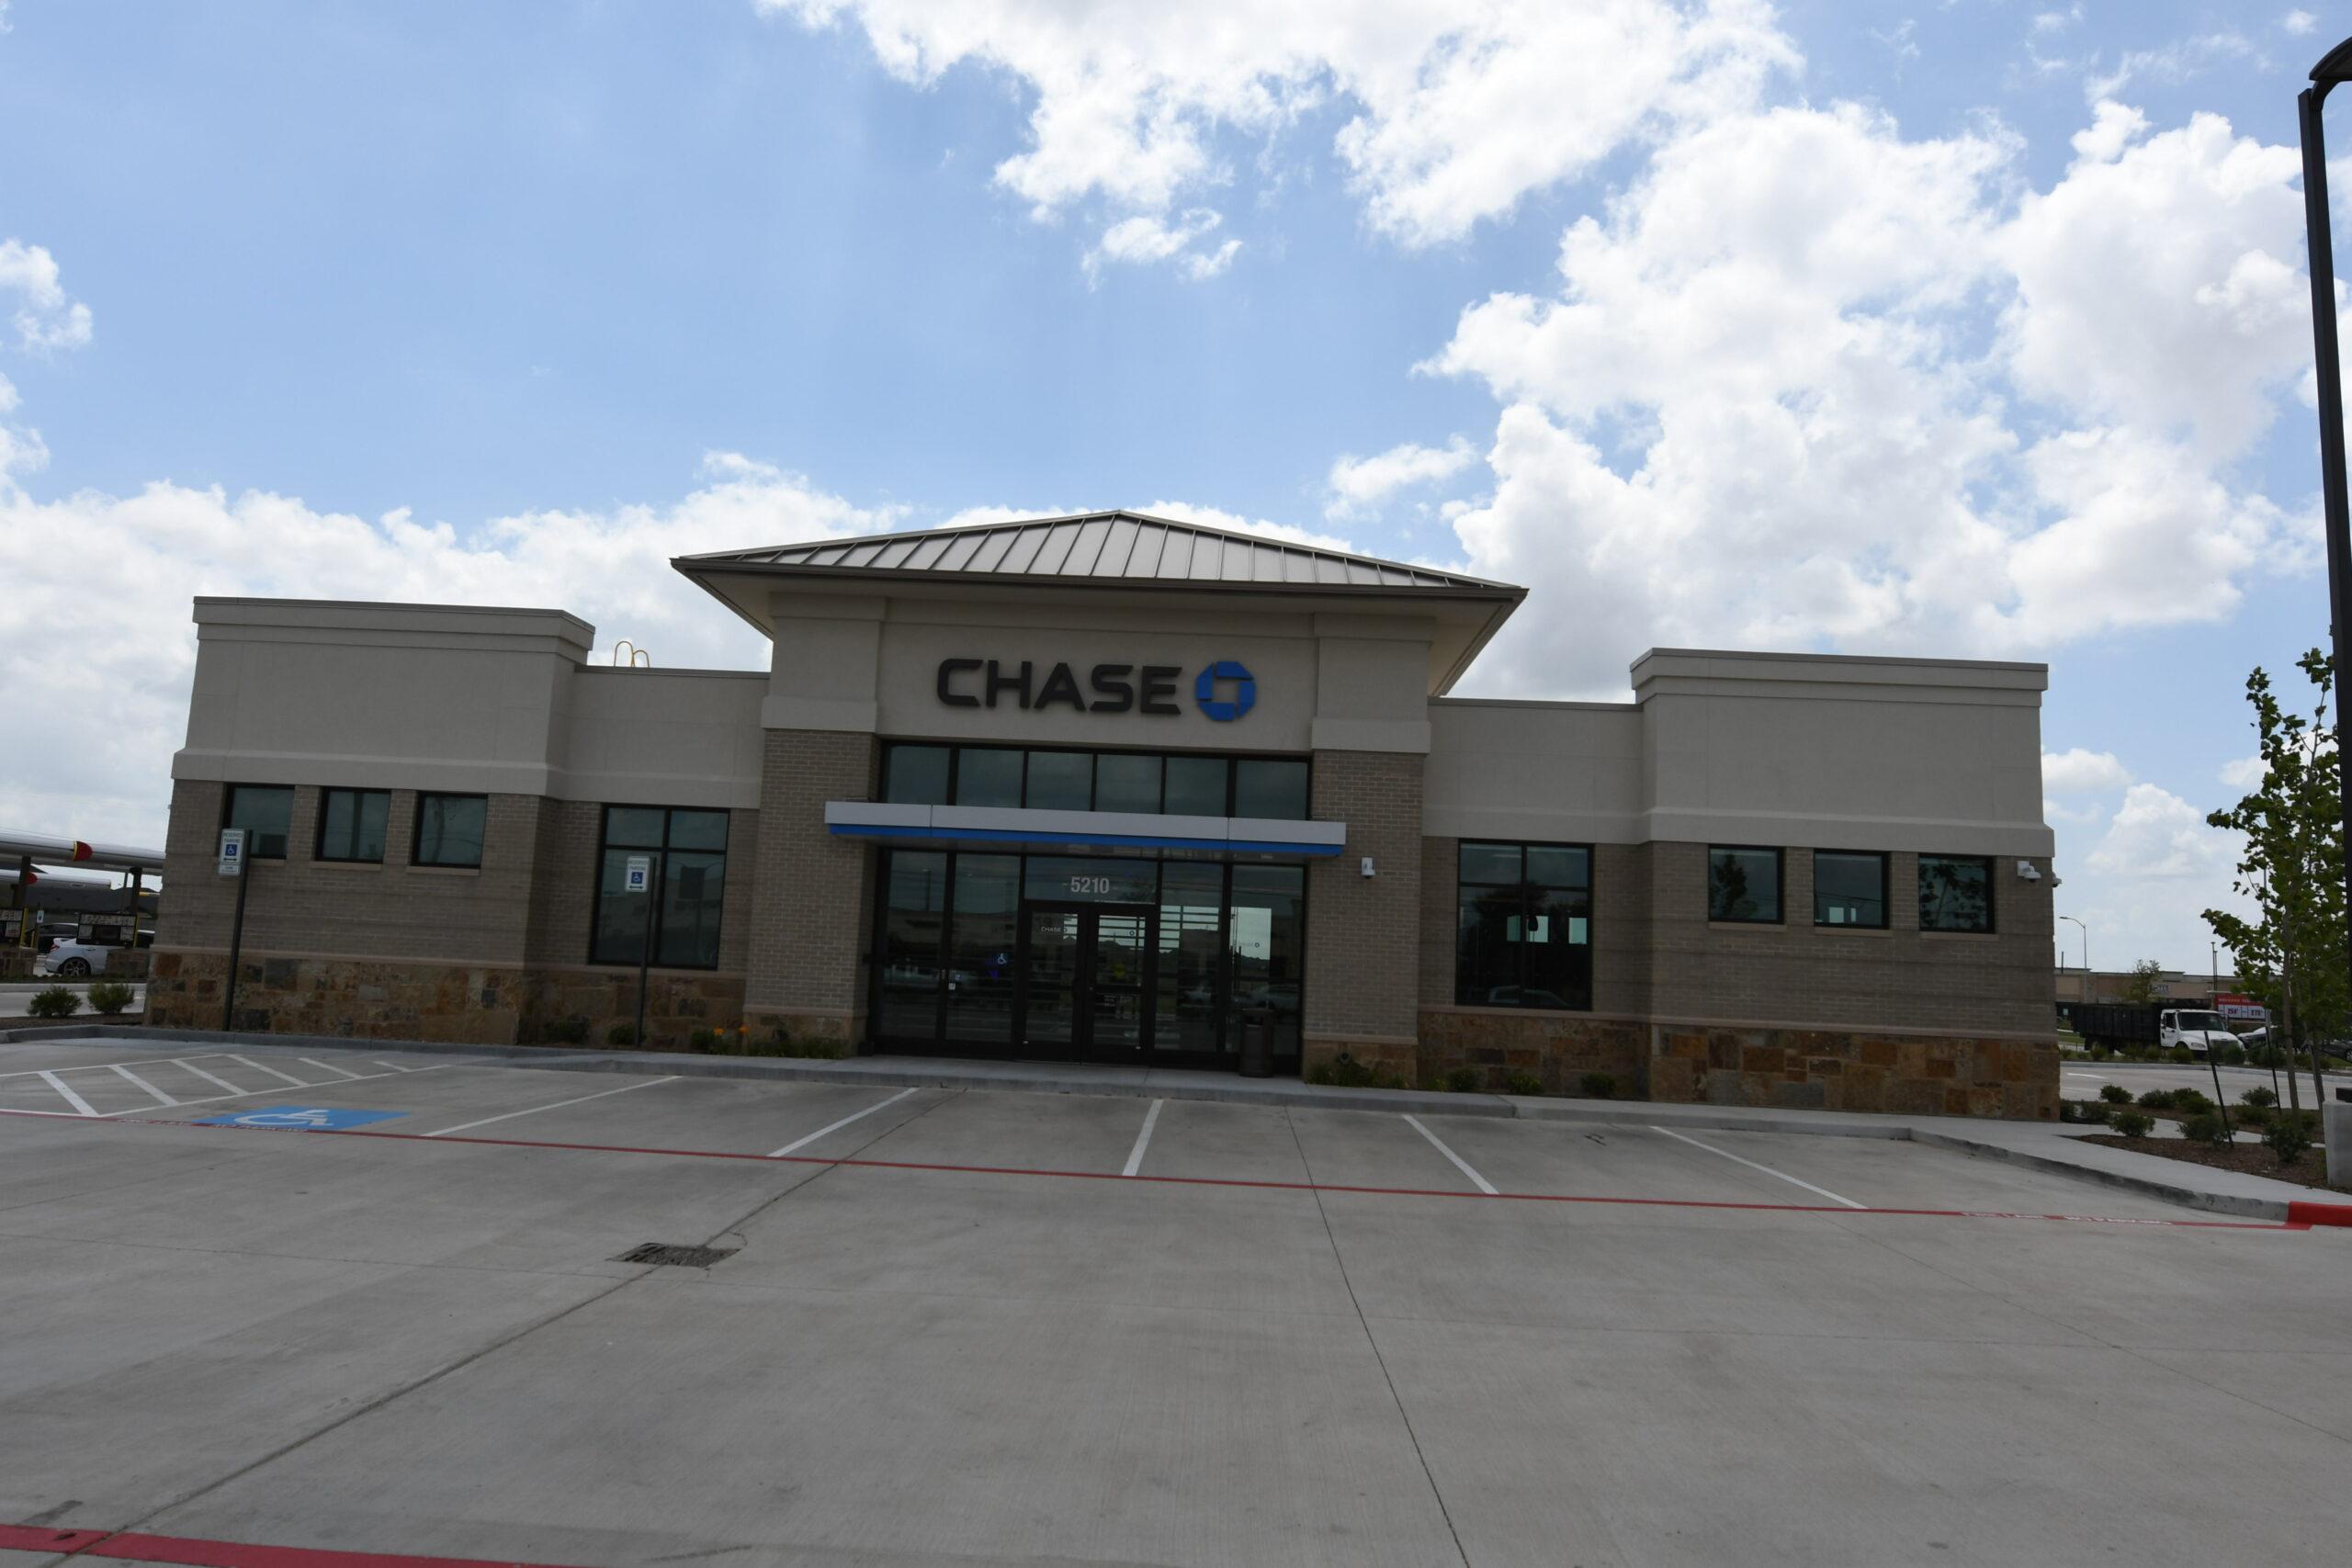 Chase Bank-Katy